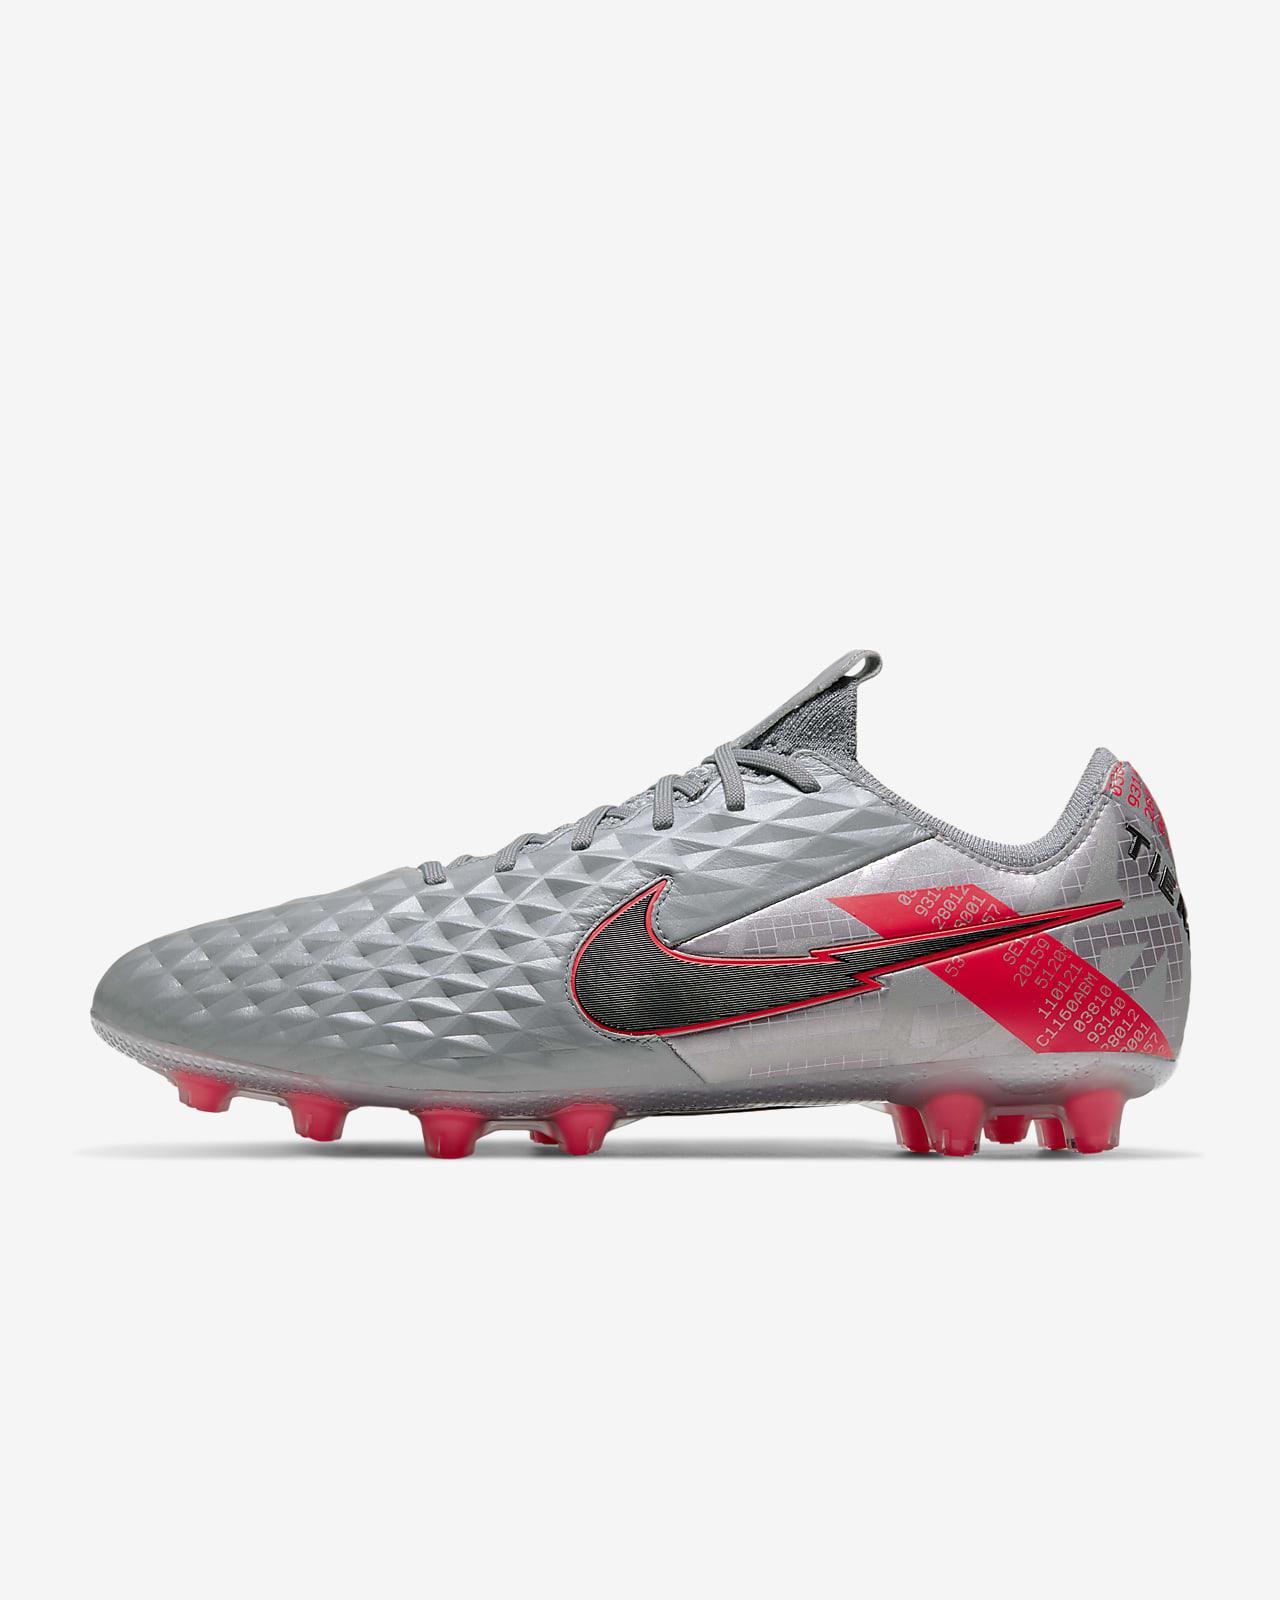 Nike Tiempo Legend 8 Elite Hg Hard Ground Soccer Cleat Nike Jp